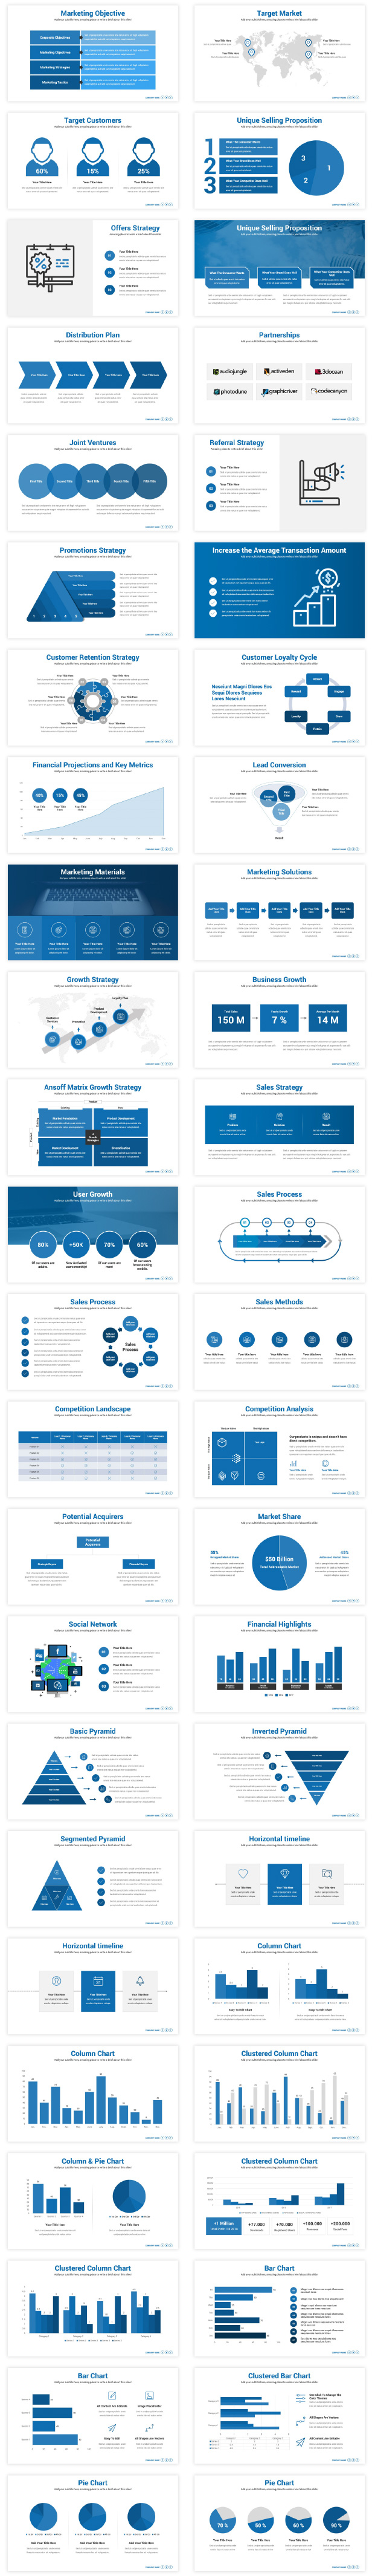 Best Marketing Plan PowerPoint Presentation Template 2020